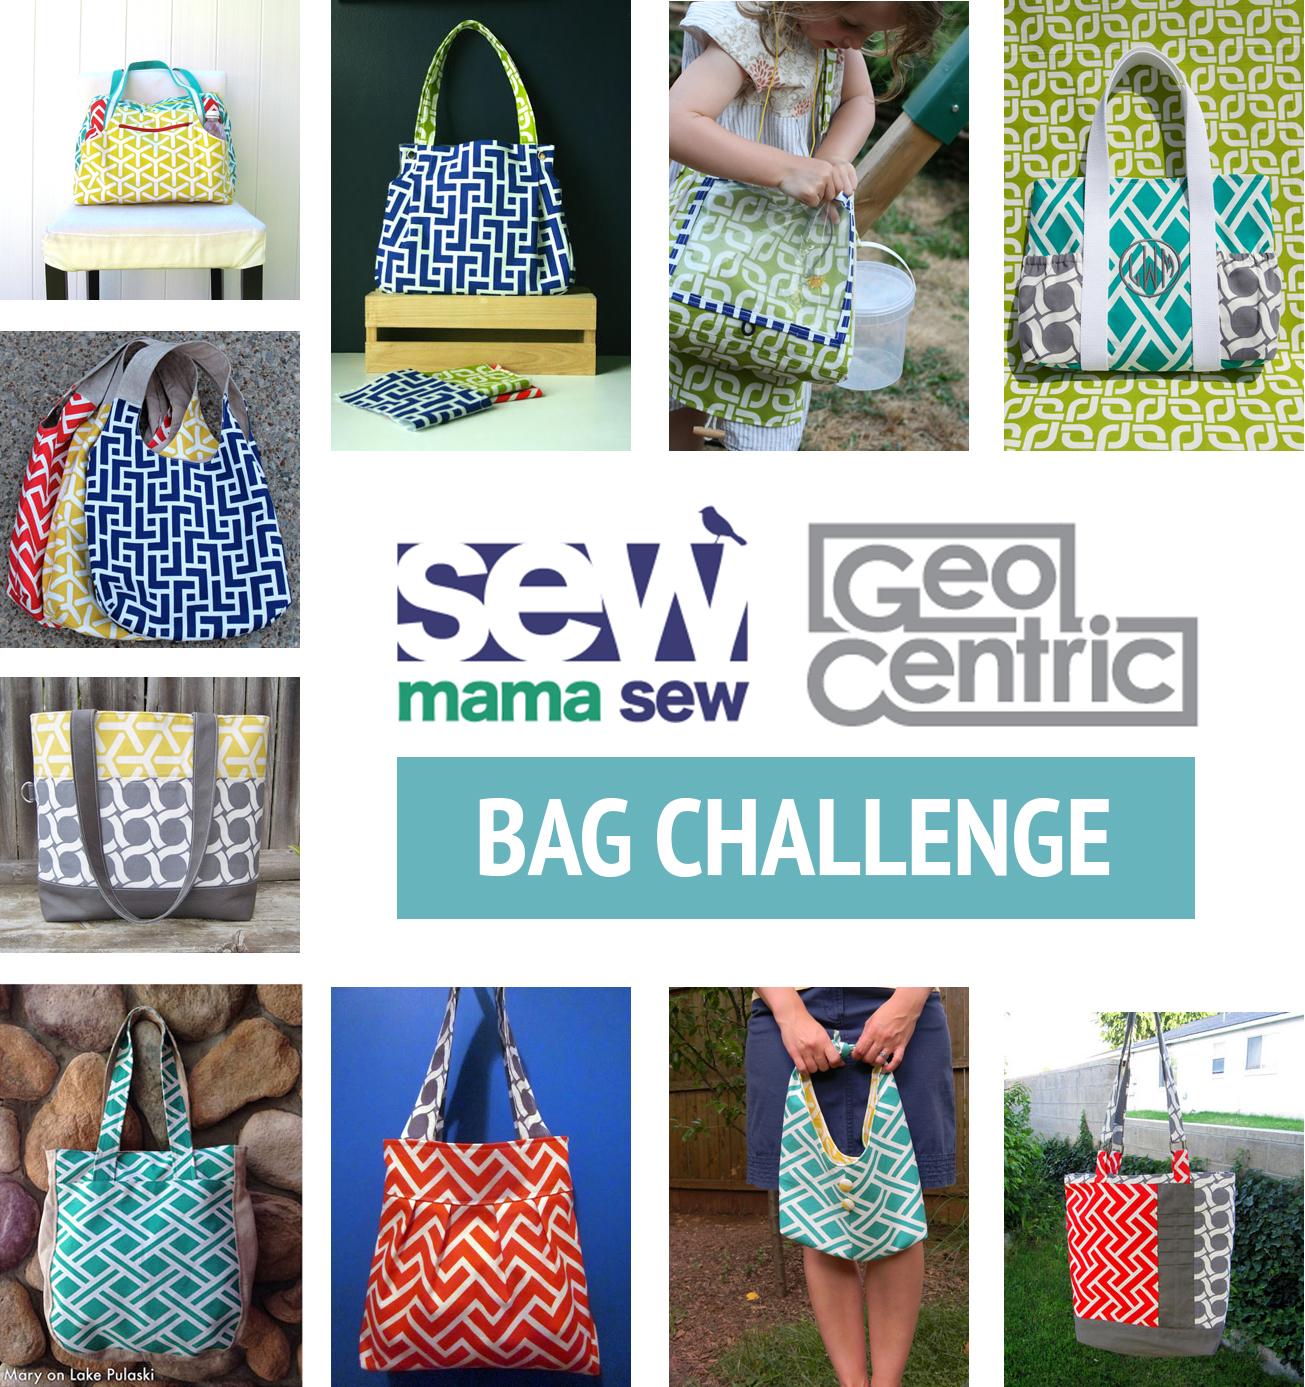 Sew mama sew geocentric bag challenge cloud9 fabrics jeuxipadfo Image collections